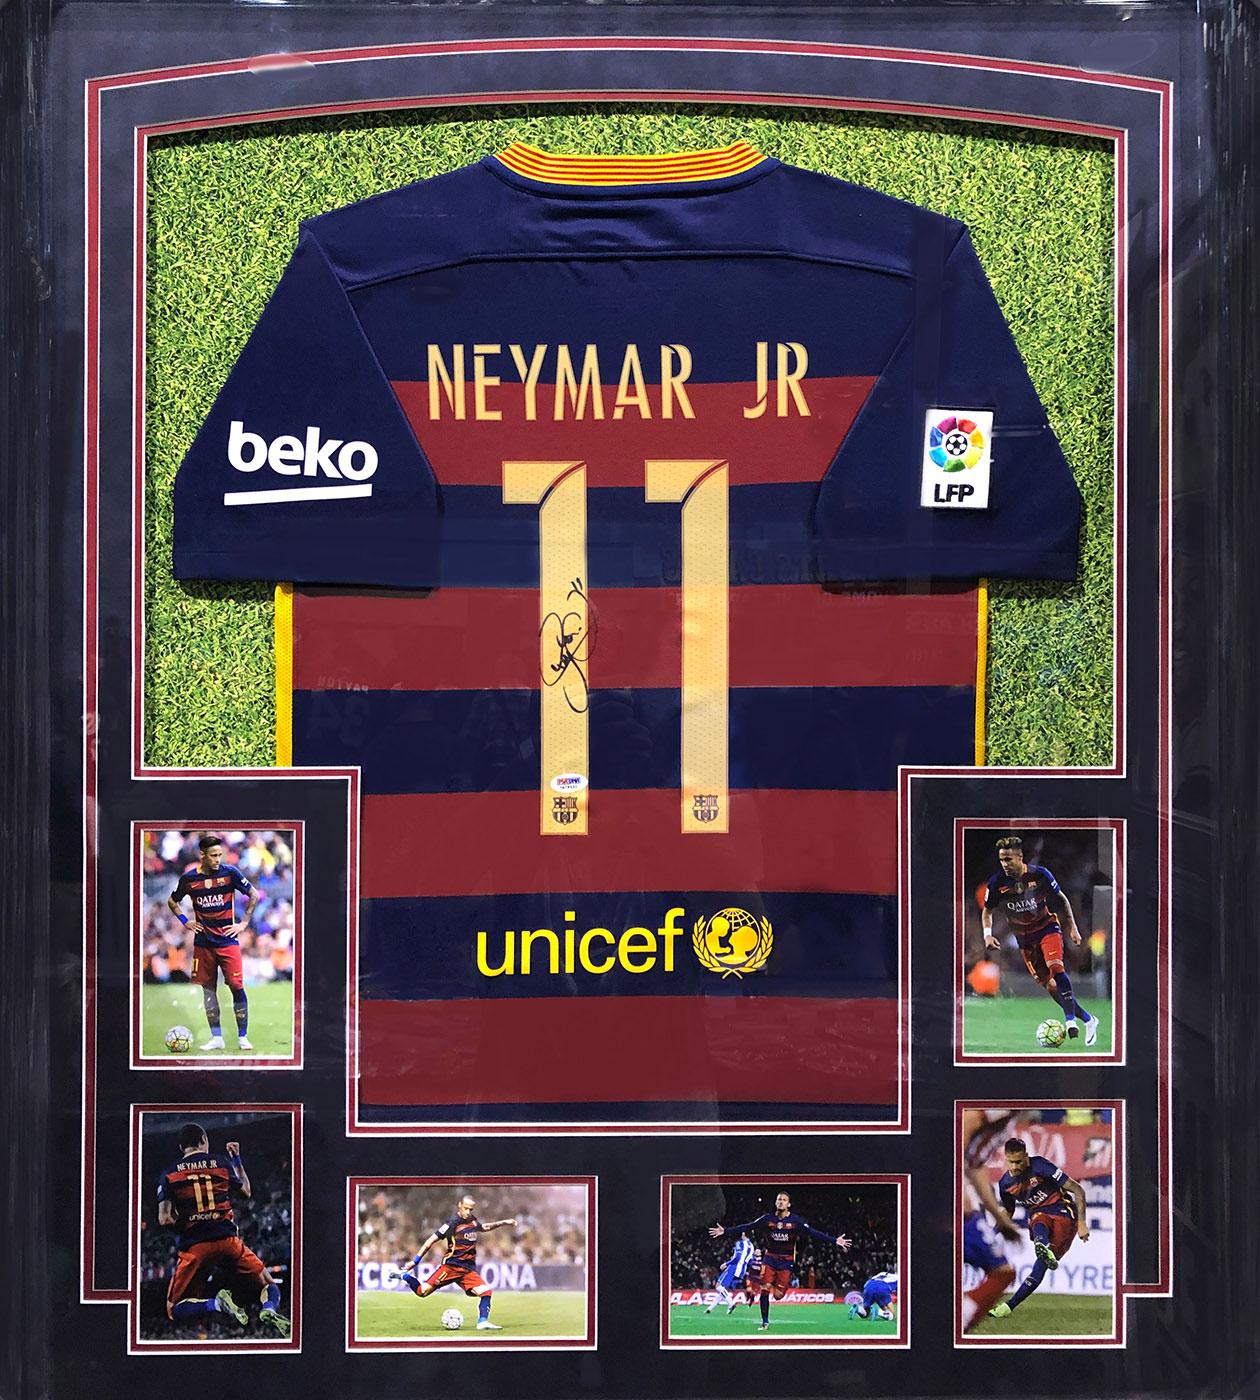 Neymar Jersey | Framed Sports Memorabilia